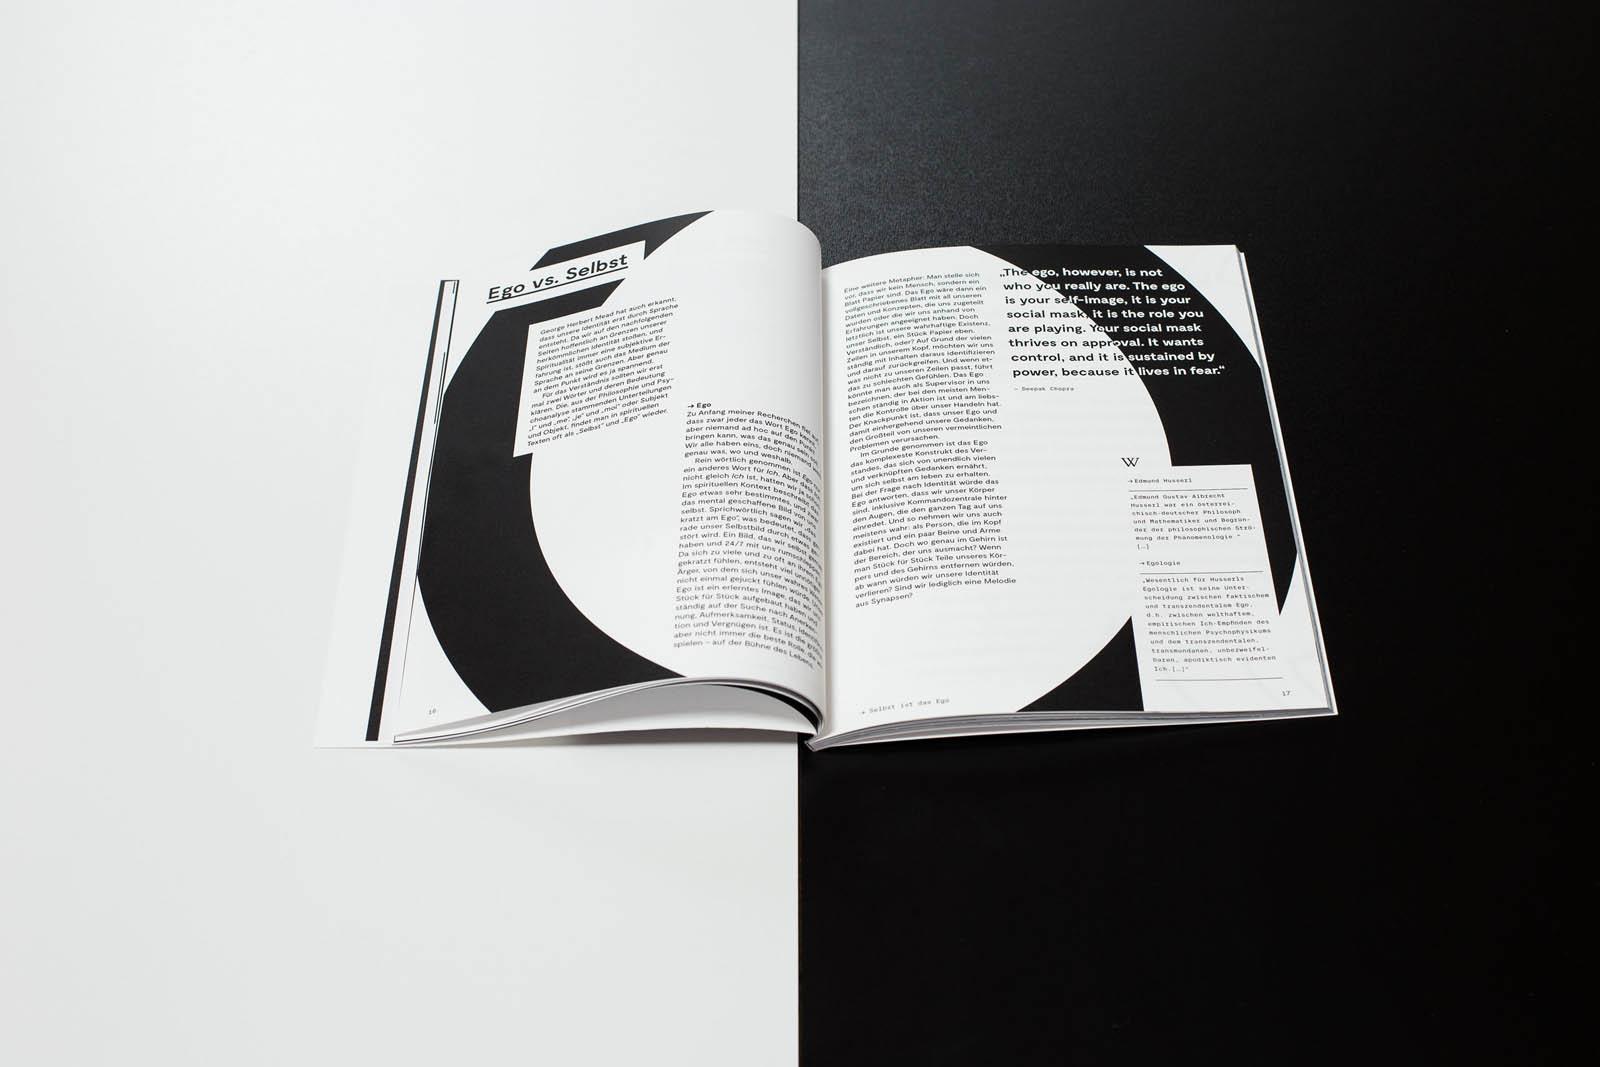 exit ego magazin